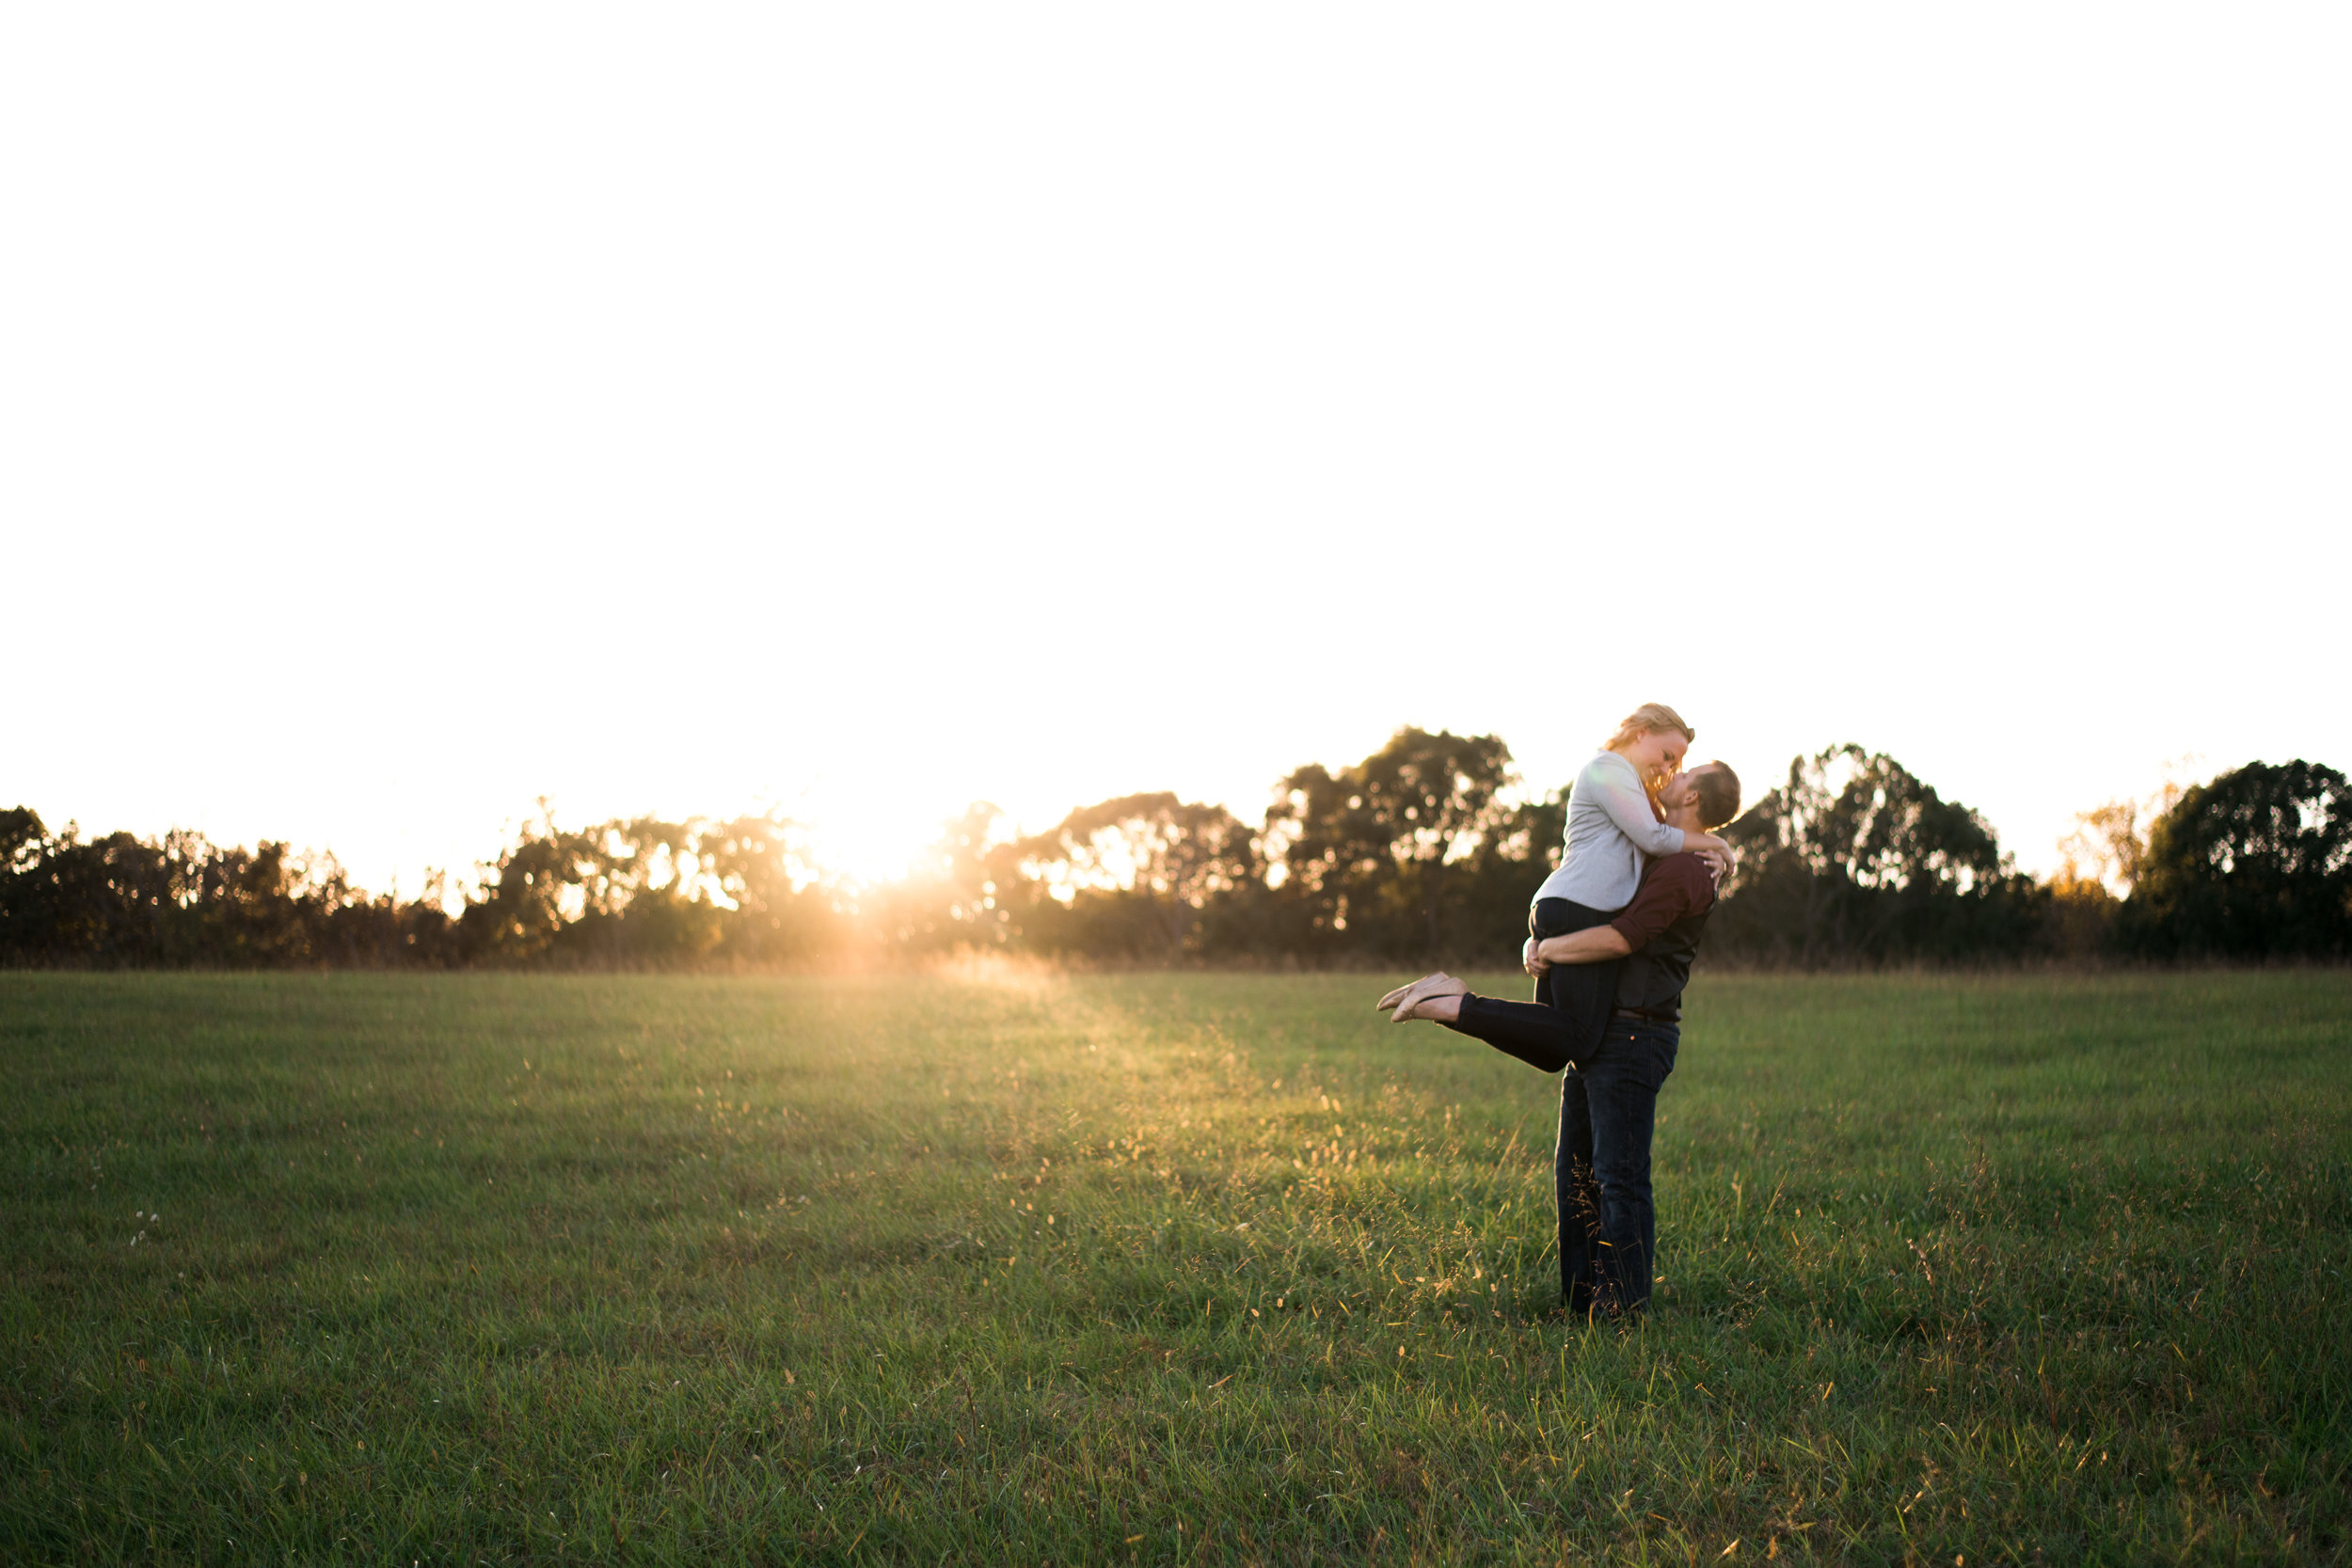 Lynchburg_College_Sorella_Farms_Baseball_Ballet_Virginia_Engagement_Session_Wedding_Photographers (74).jpg